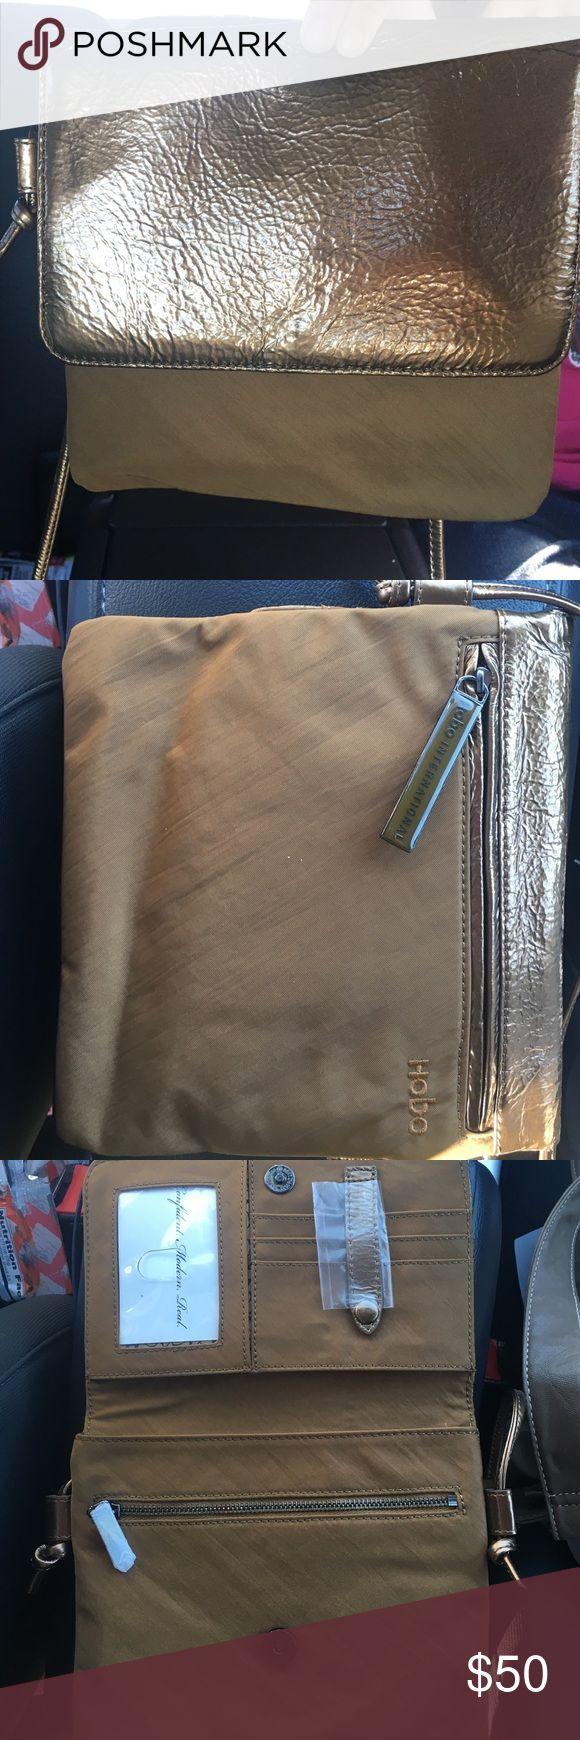 "HOBO International cross body purse!! Nylon Gold HOBO cross body purse! So cute! Perfect condition, great price☺️ 7""x7"" HOBO Bags Crossbody Bags"